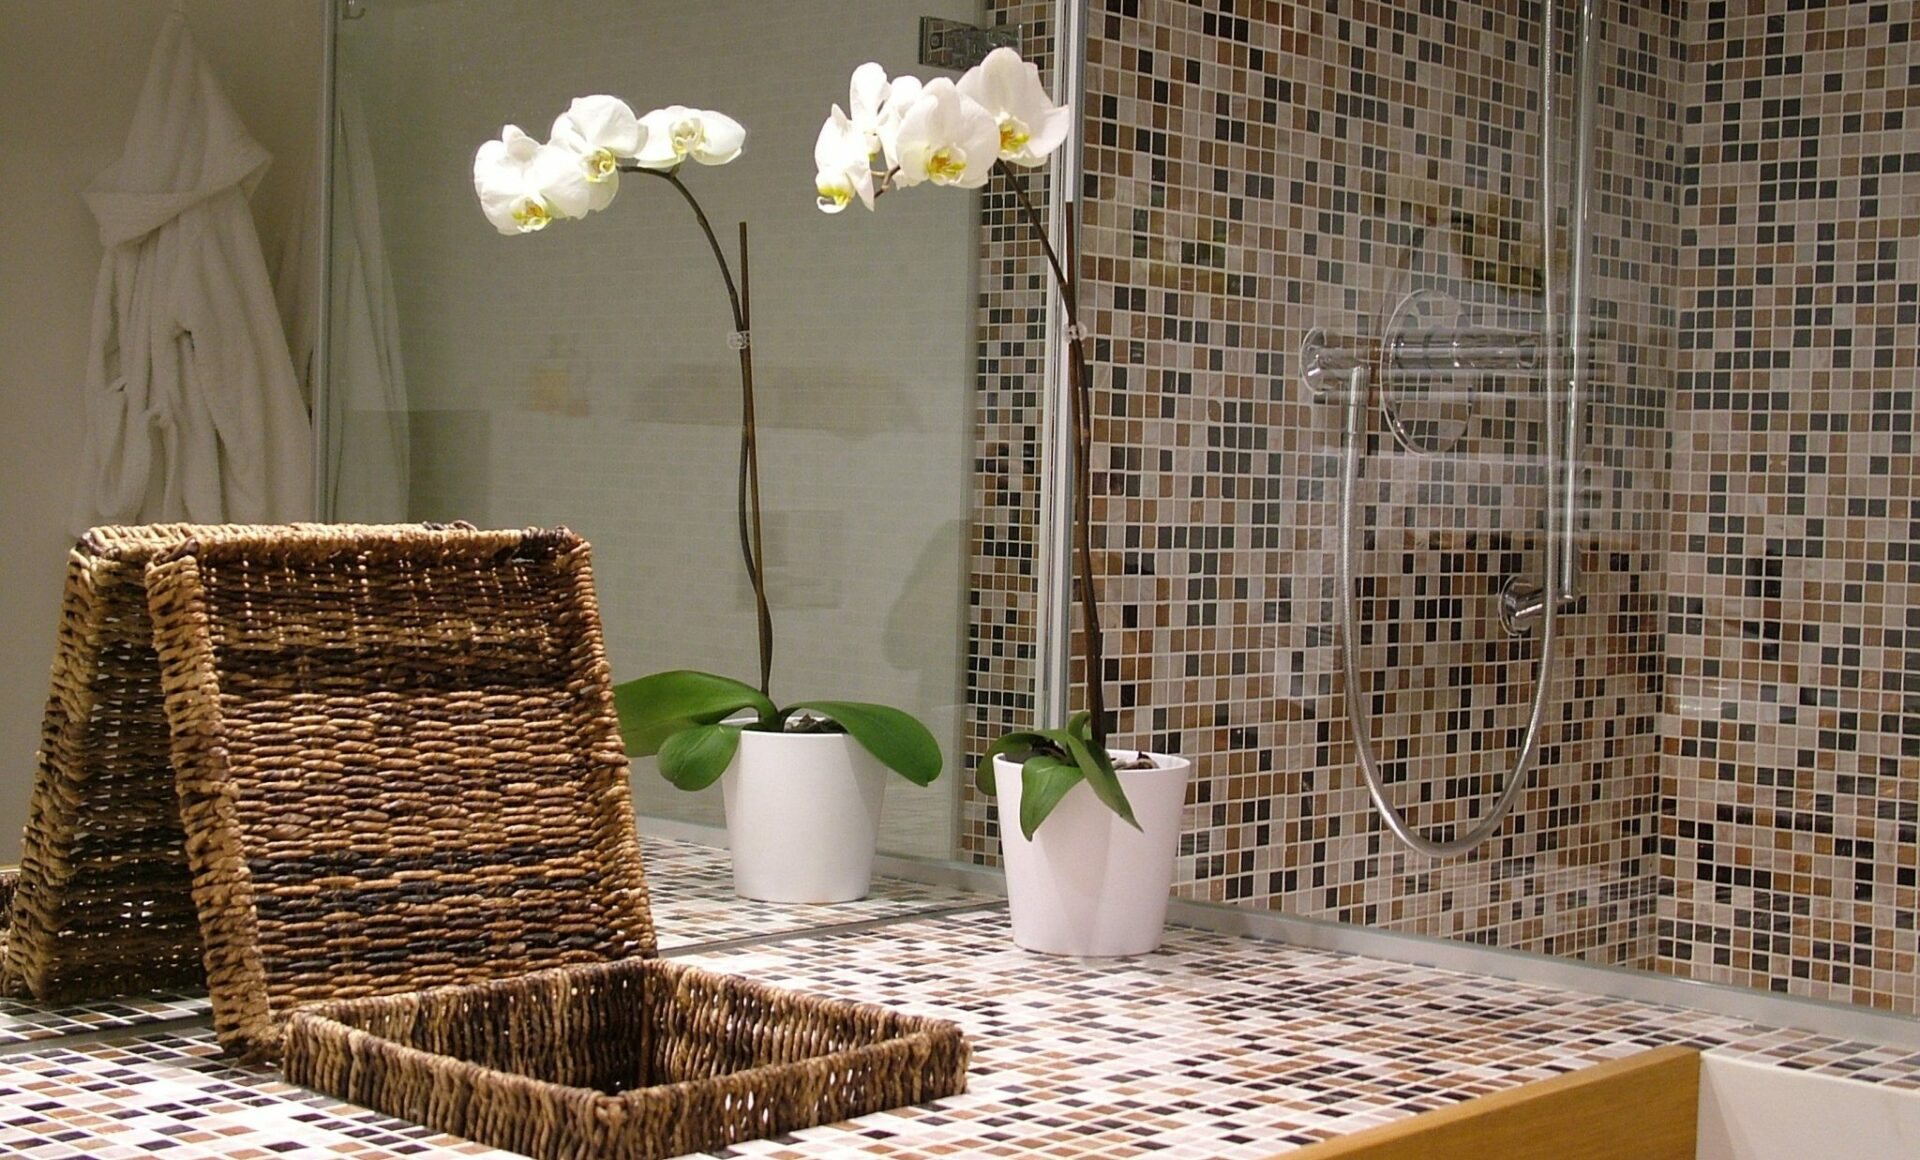 Badezimmer Waschtisch Dusche Mosaik